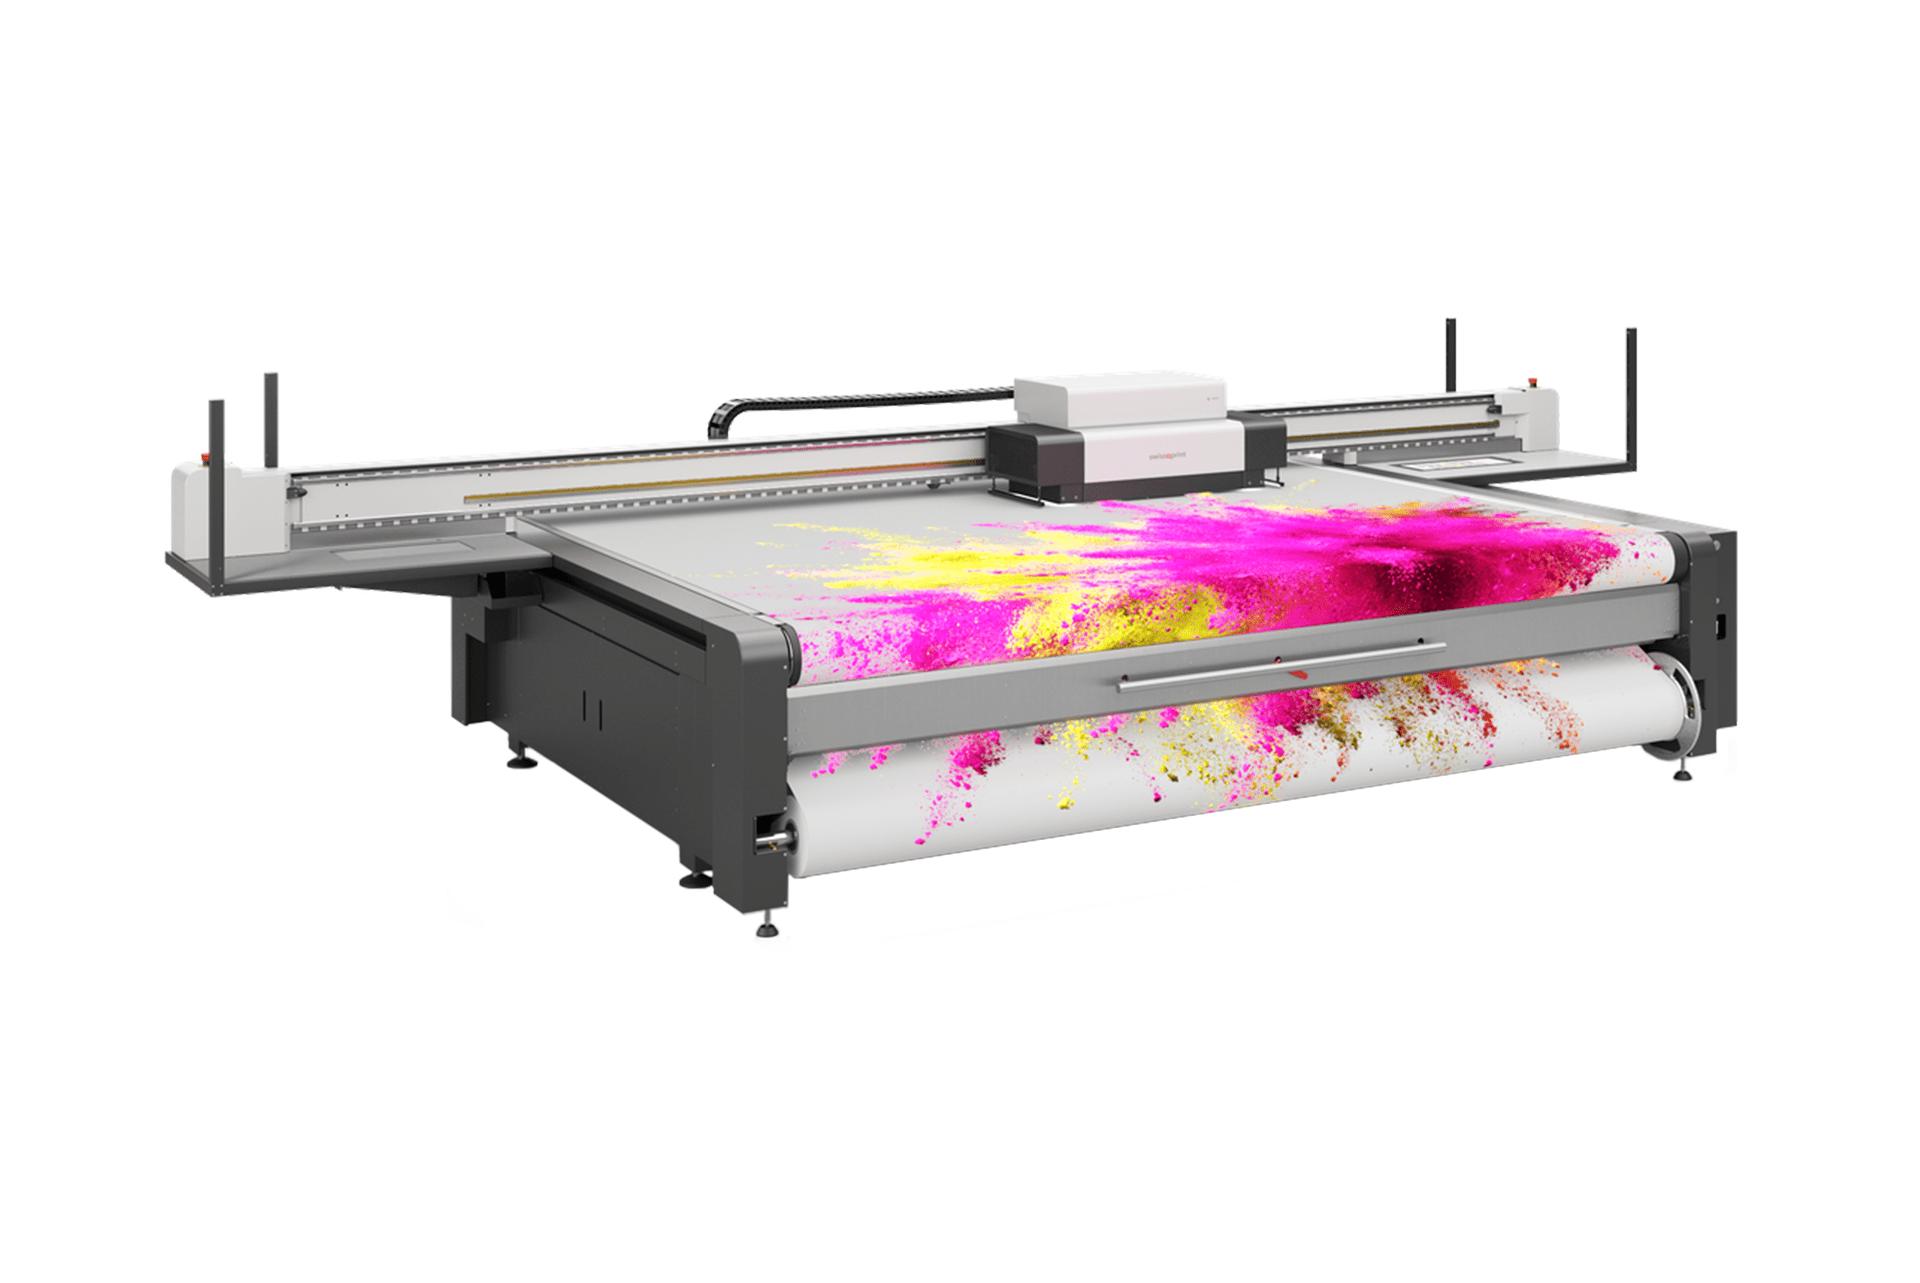 maskinene-swissqprinter-nyala3